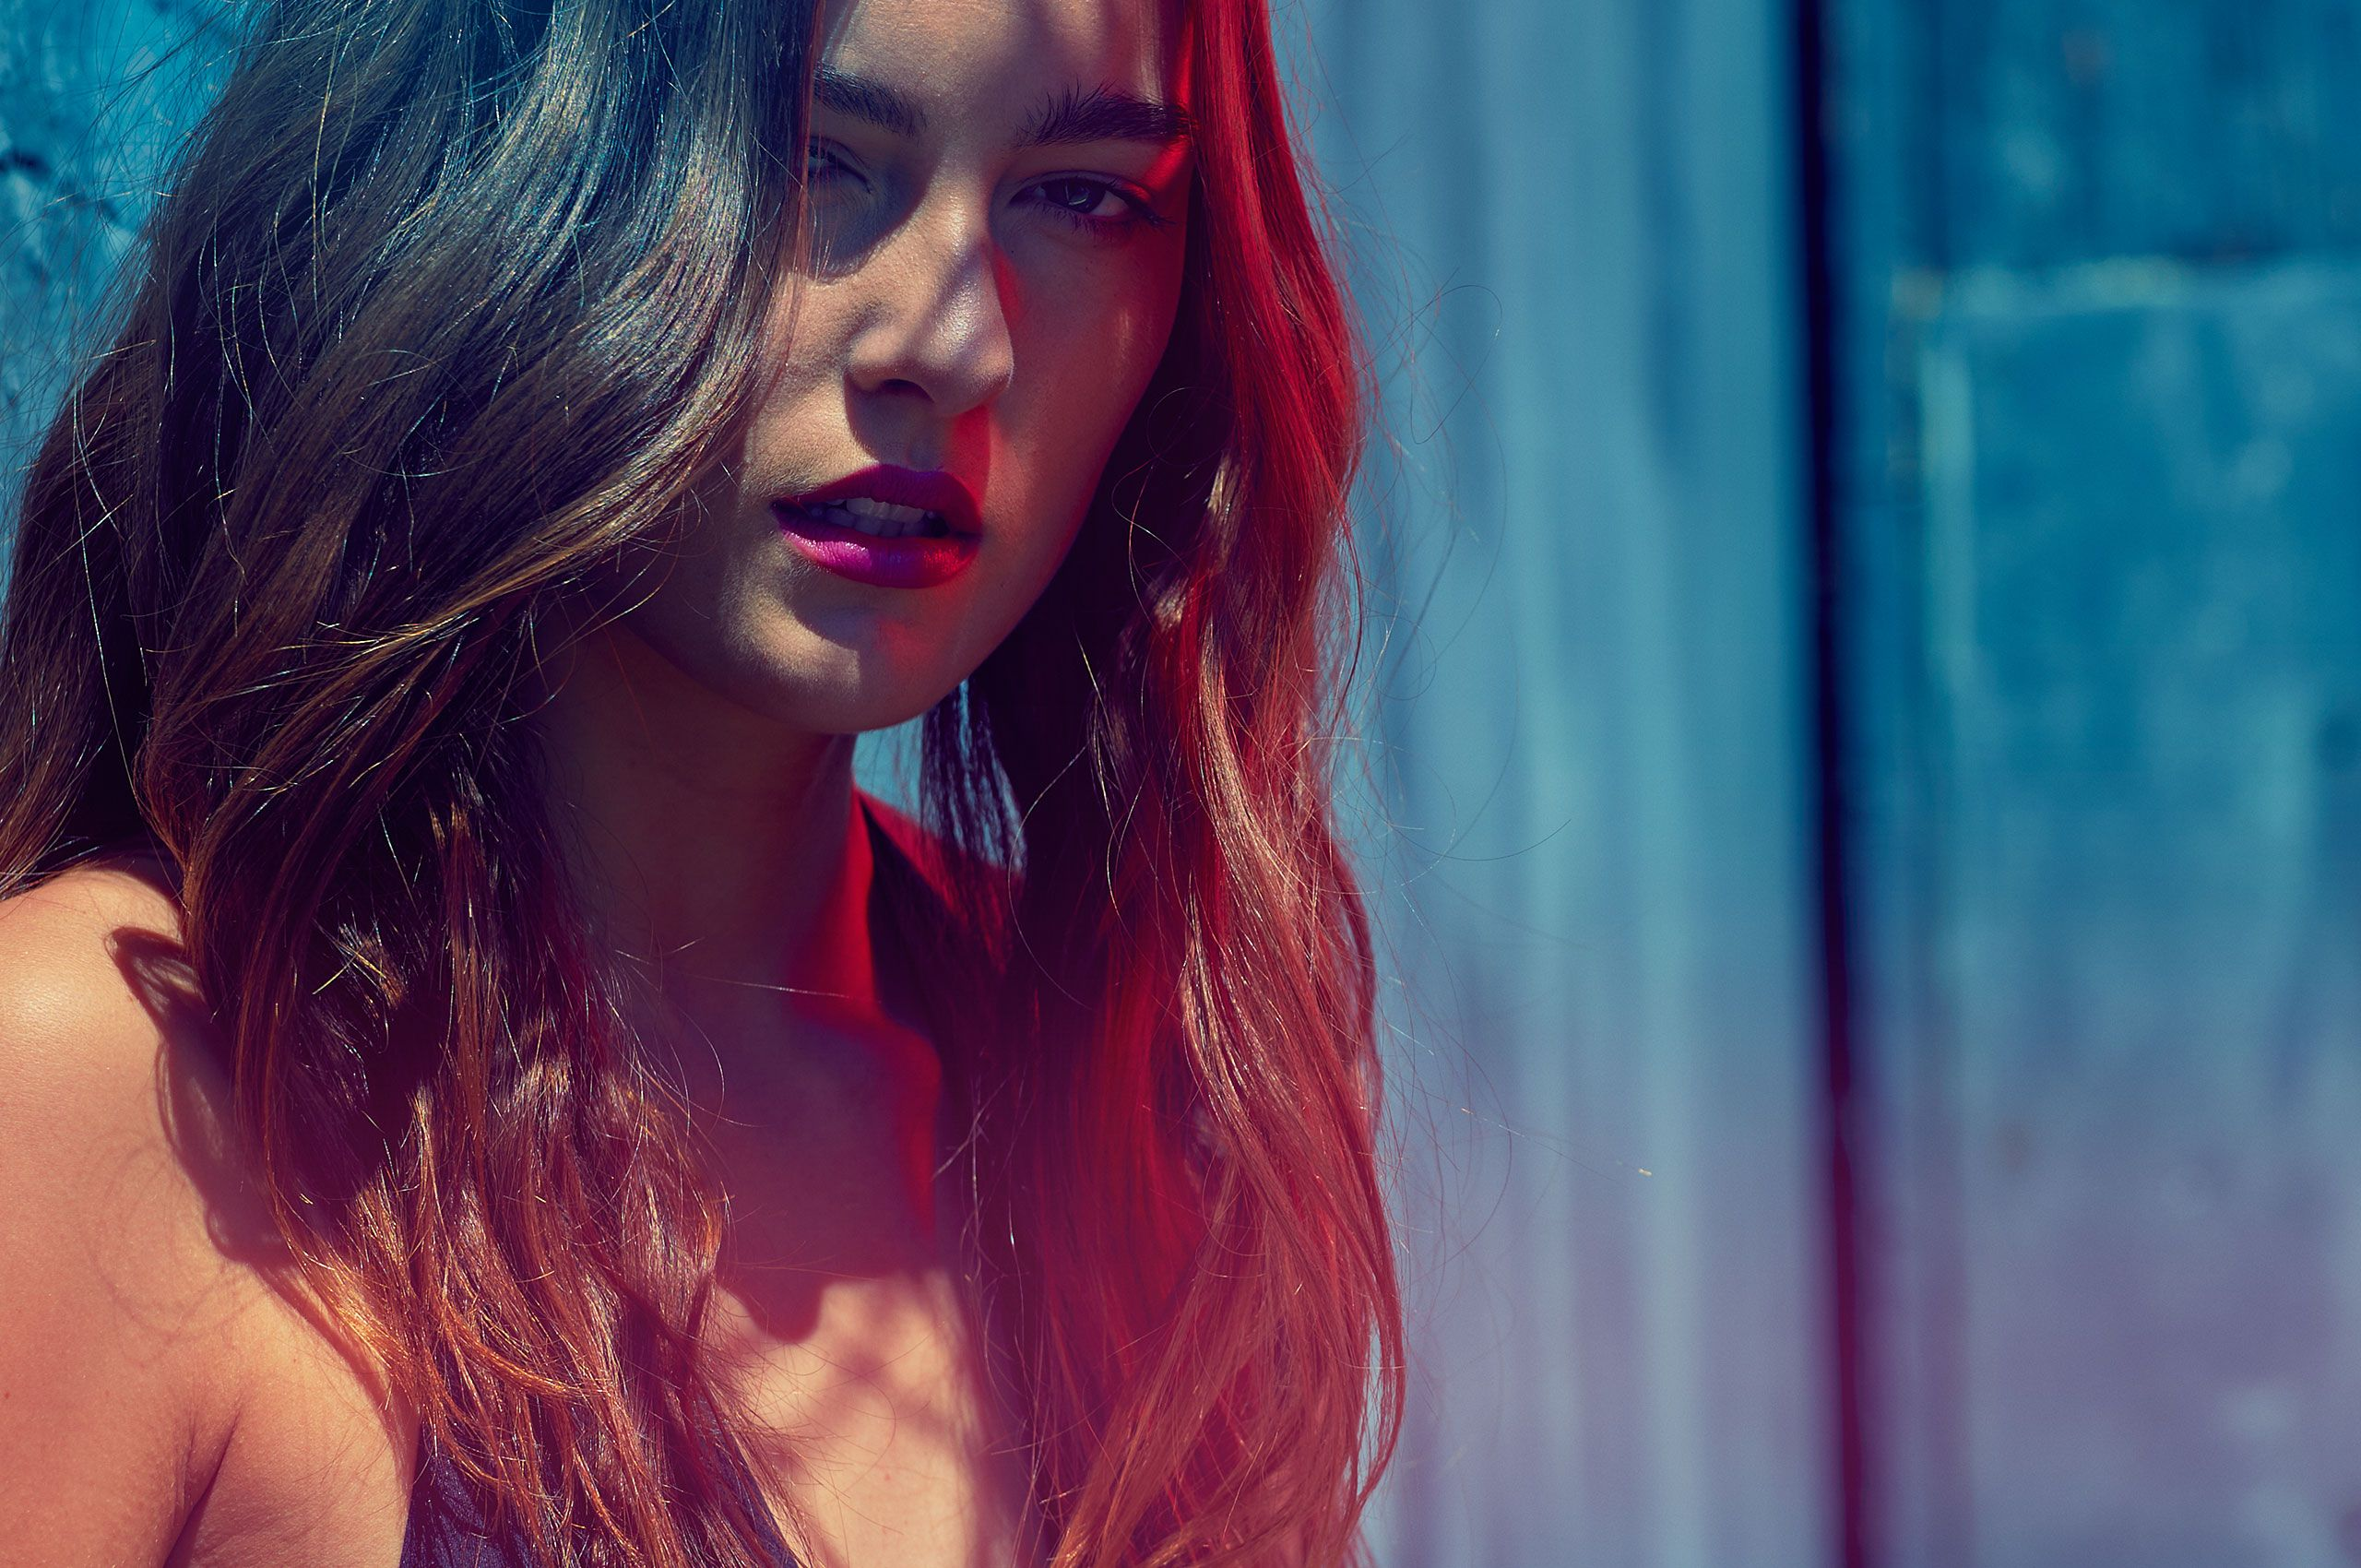 Morgan_Olson_Beauty_003.jpg